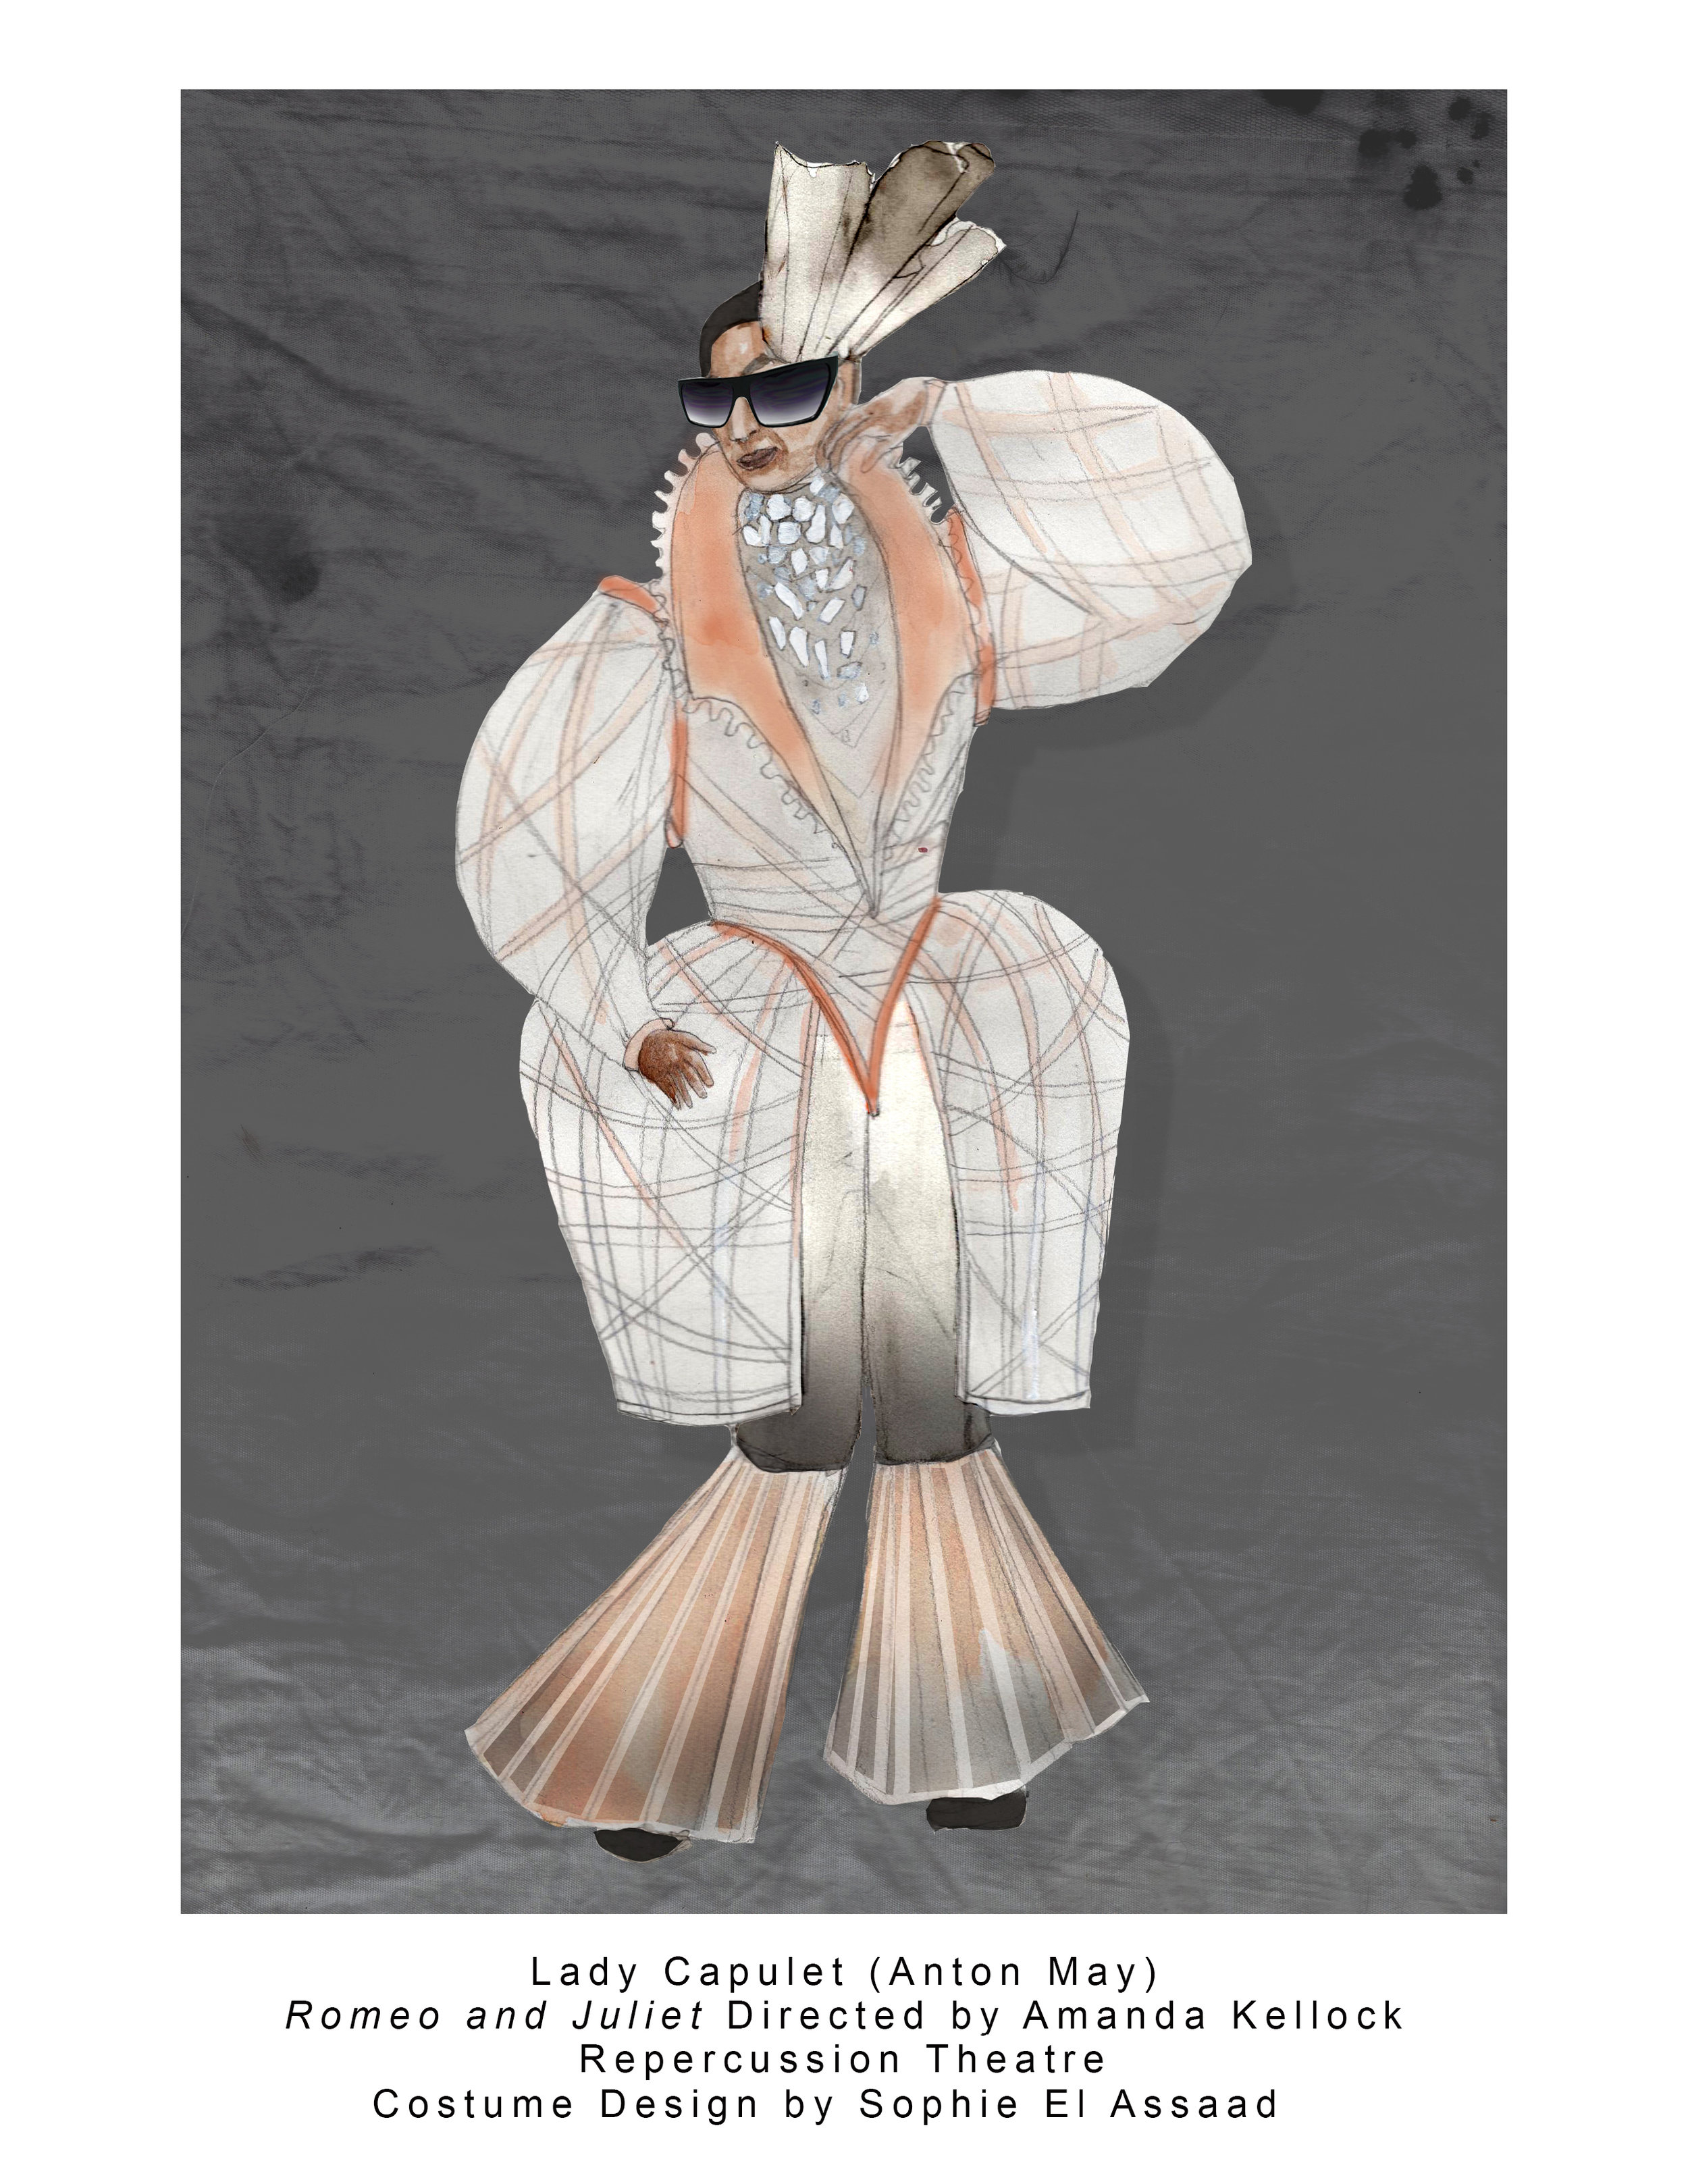 lady capulet2.jpg